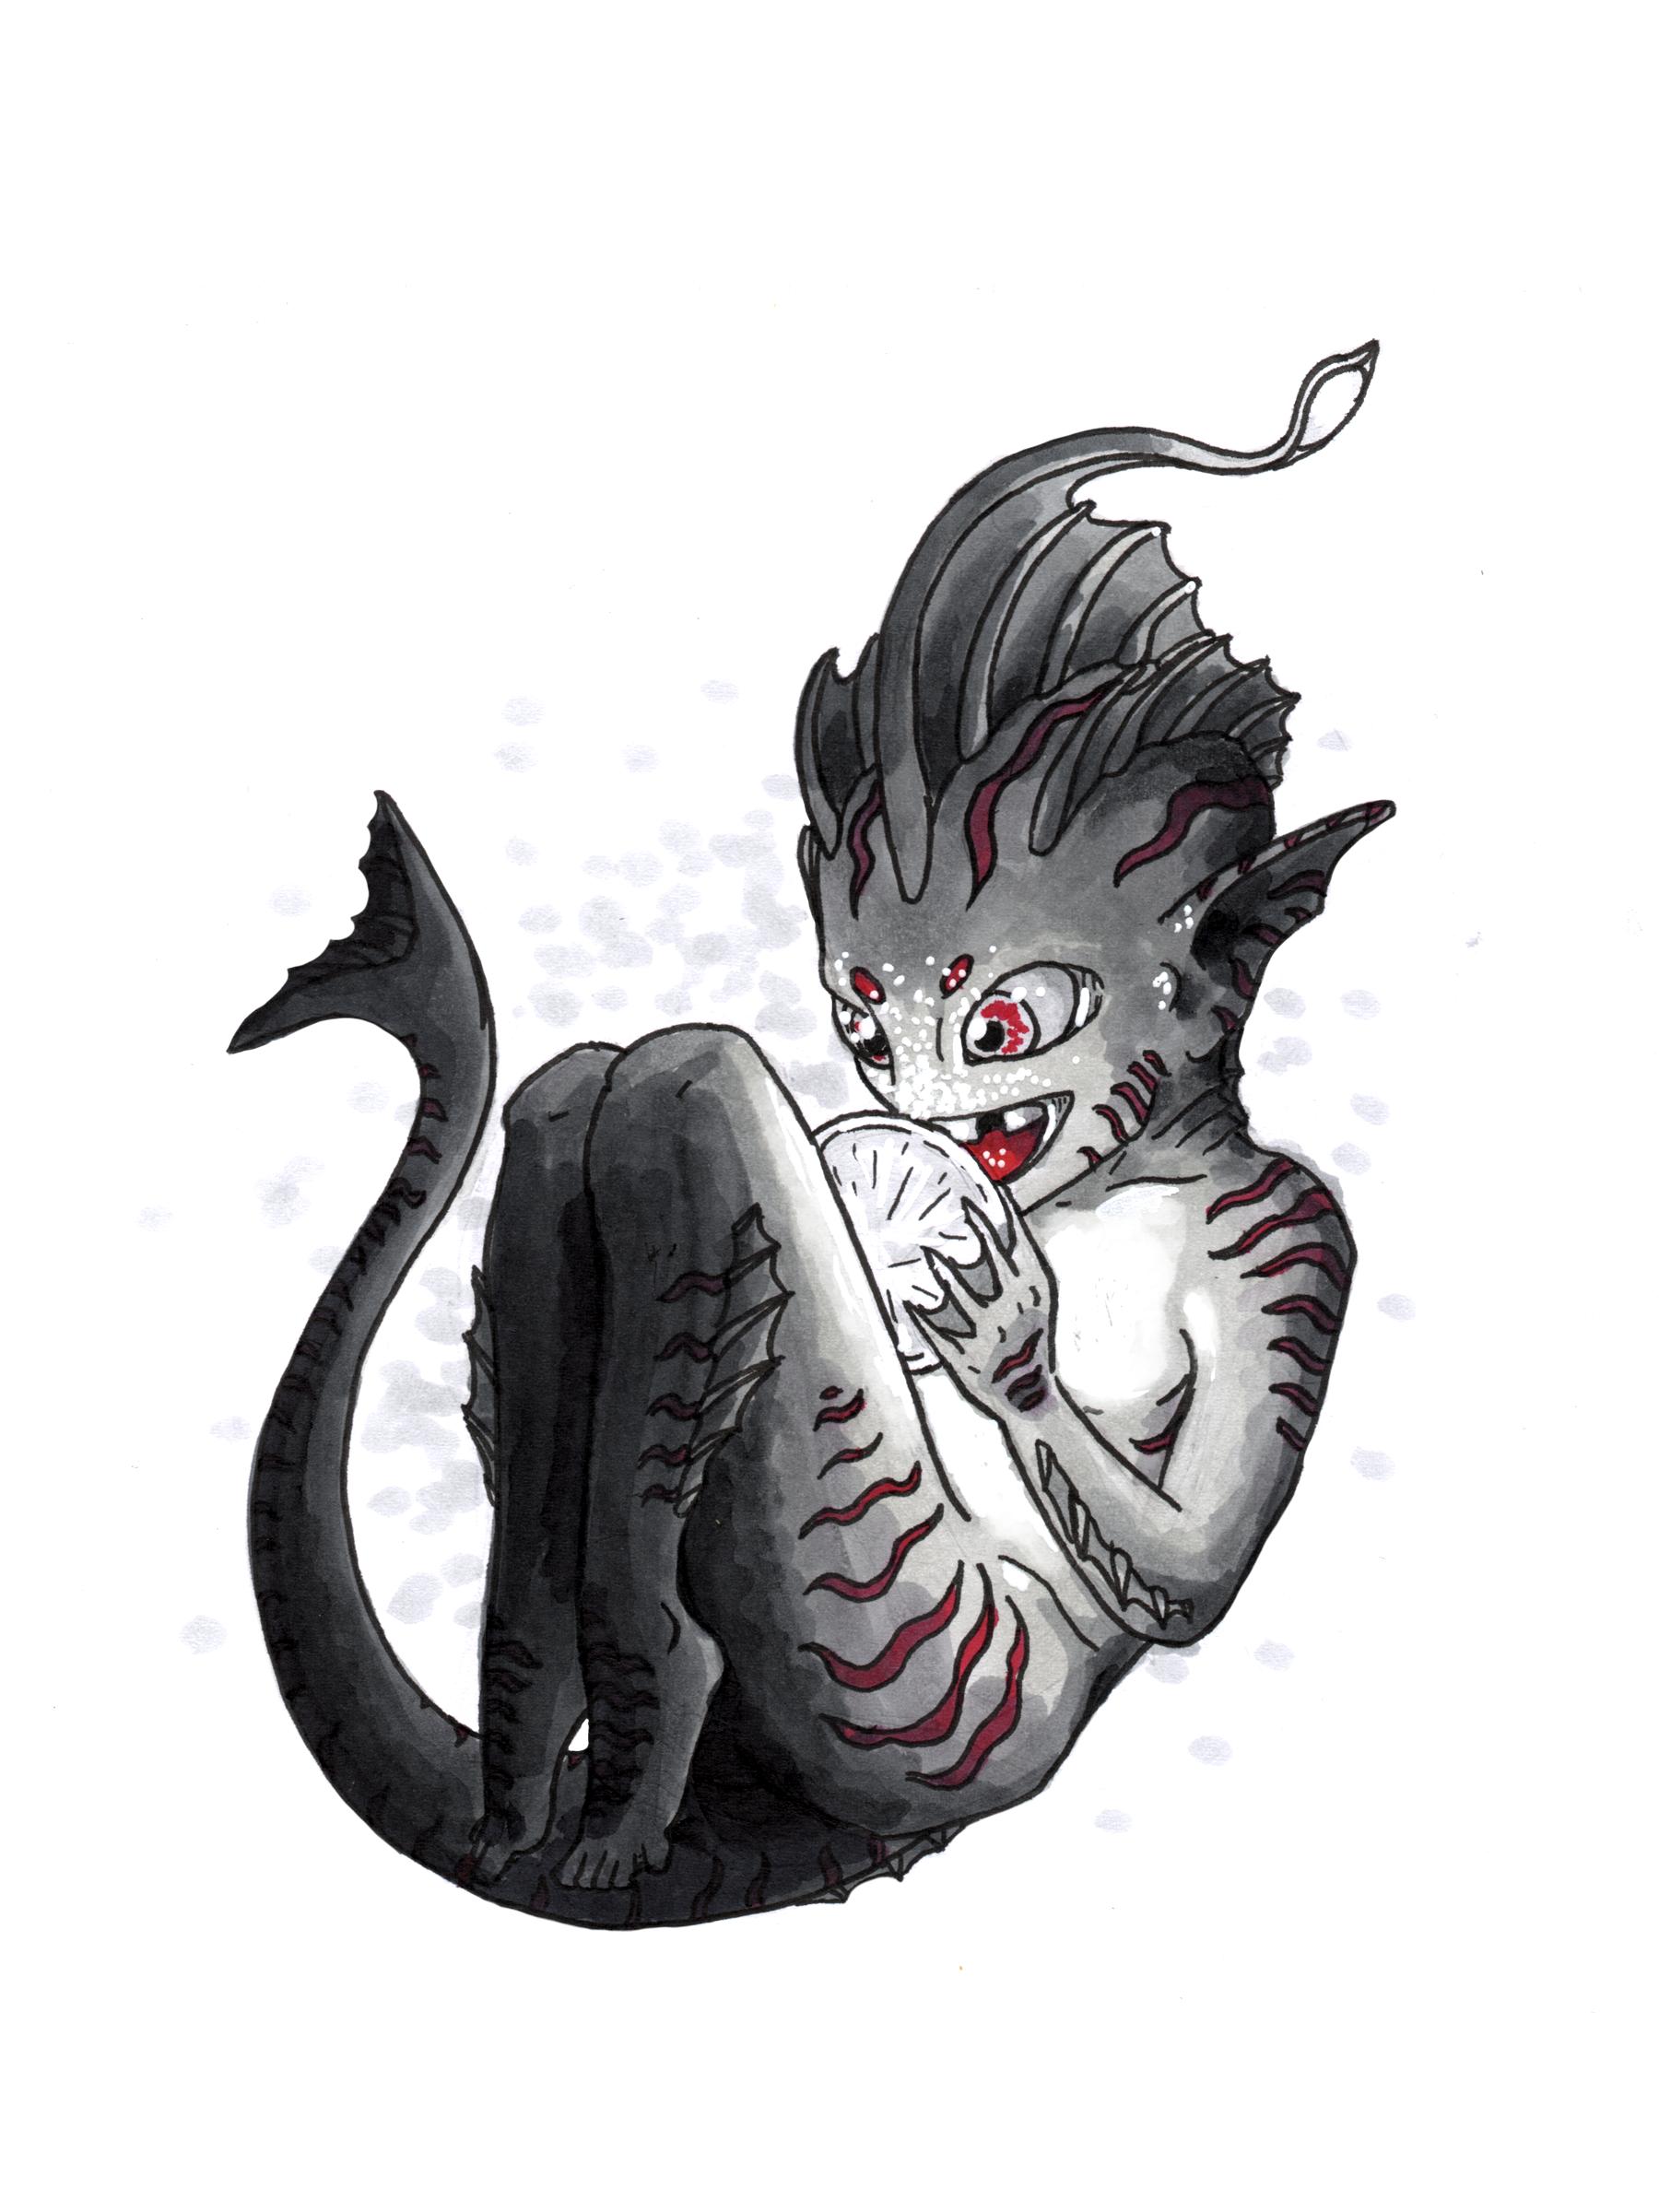 Day 06 - Mermaid